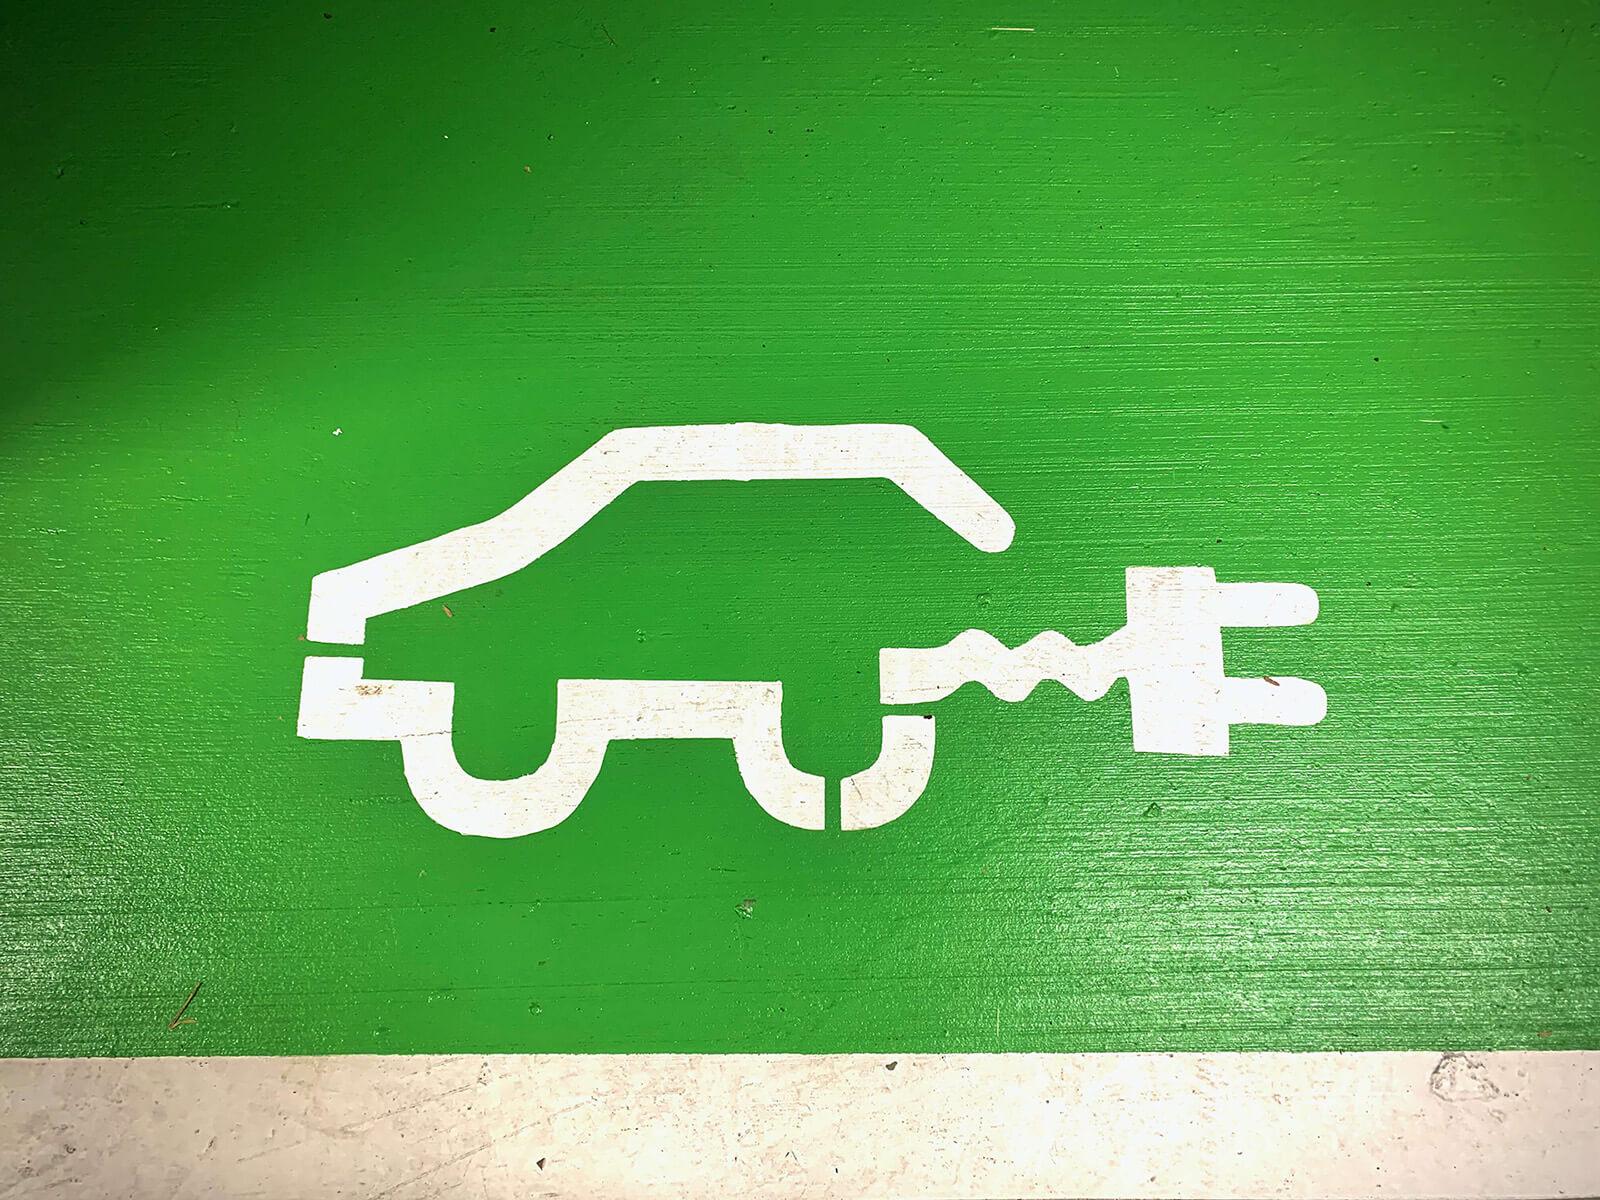 Petrol, Diesel and Hybrid Car Ban Brought Forward